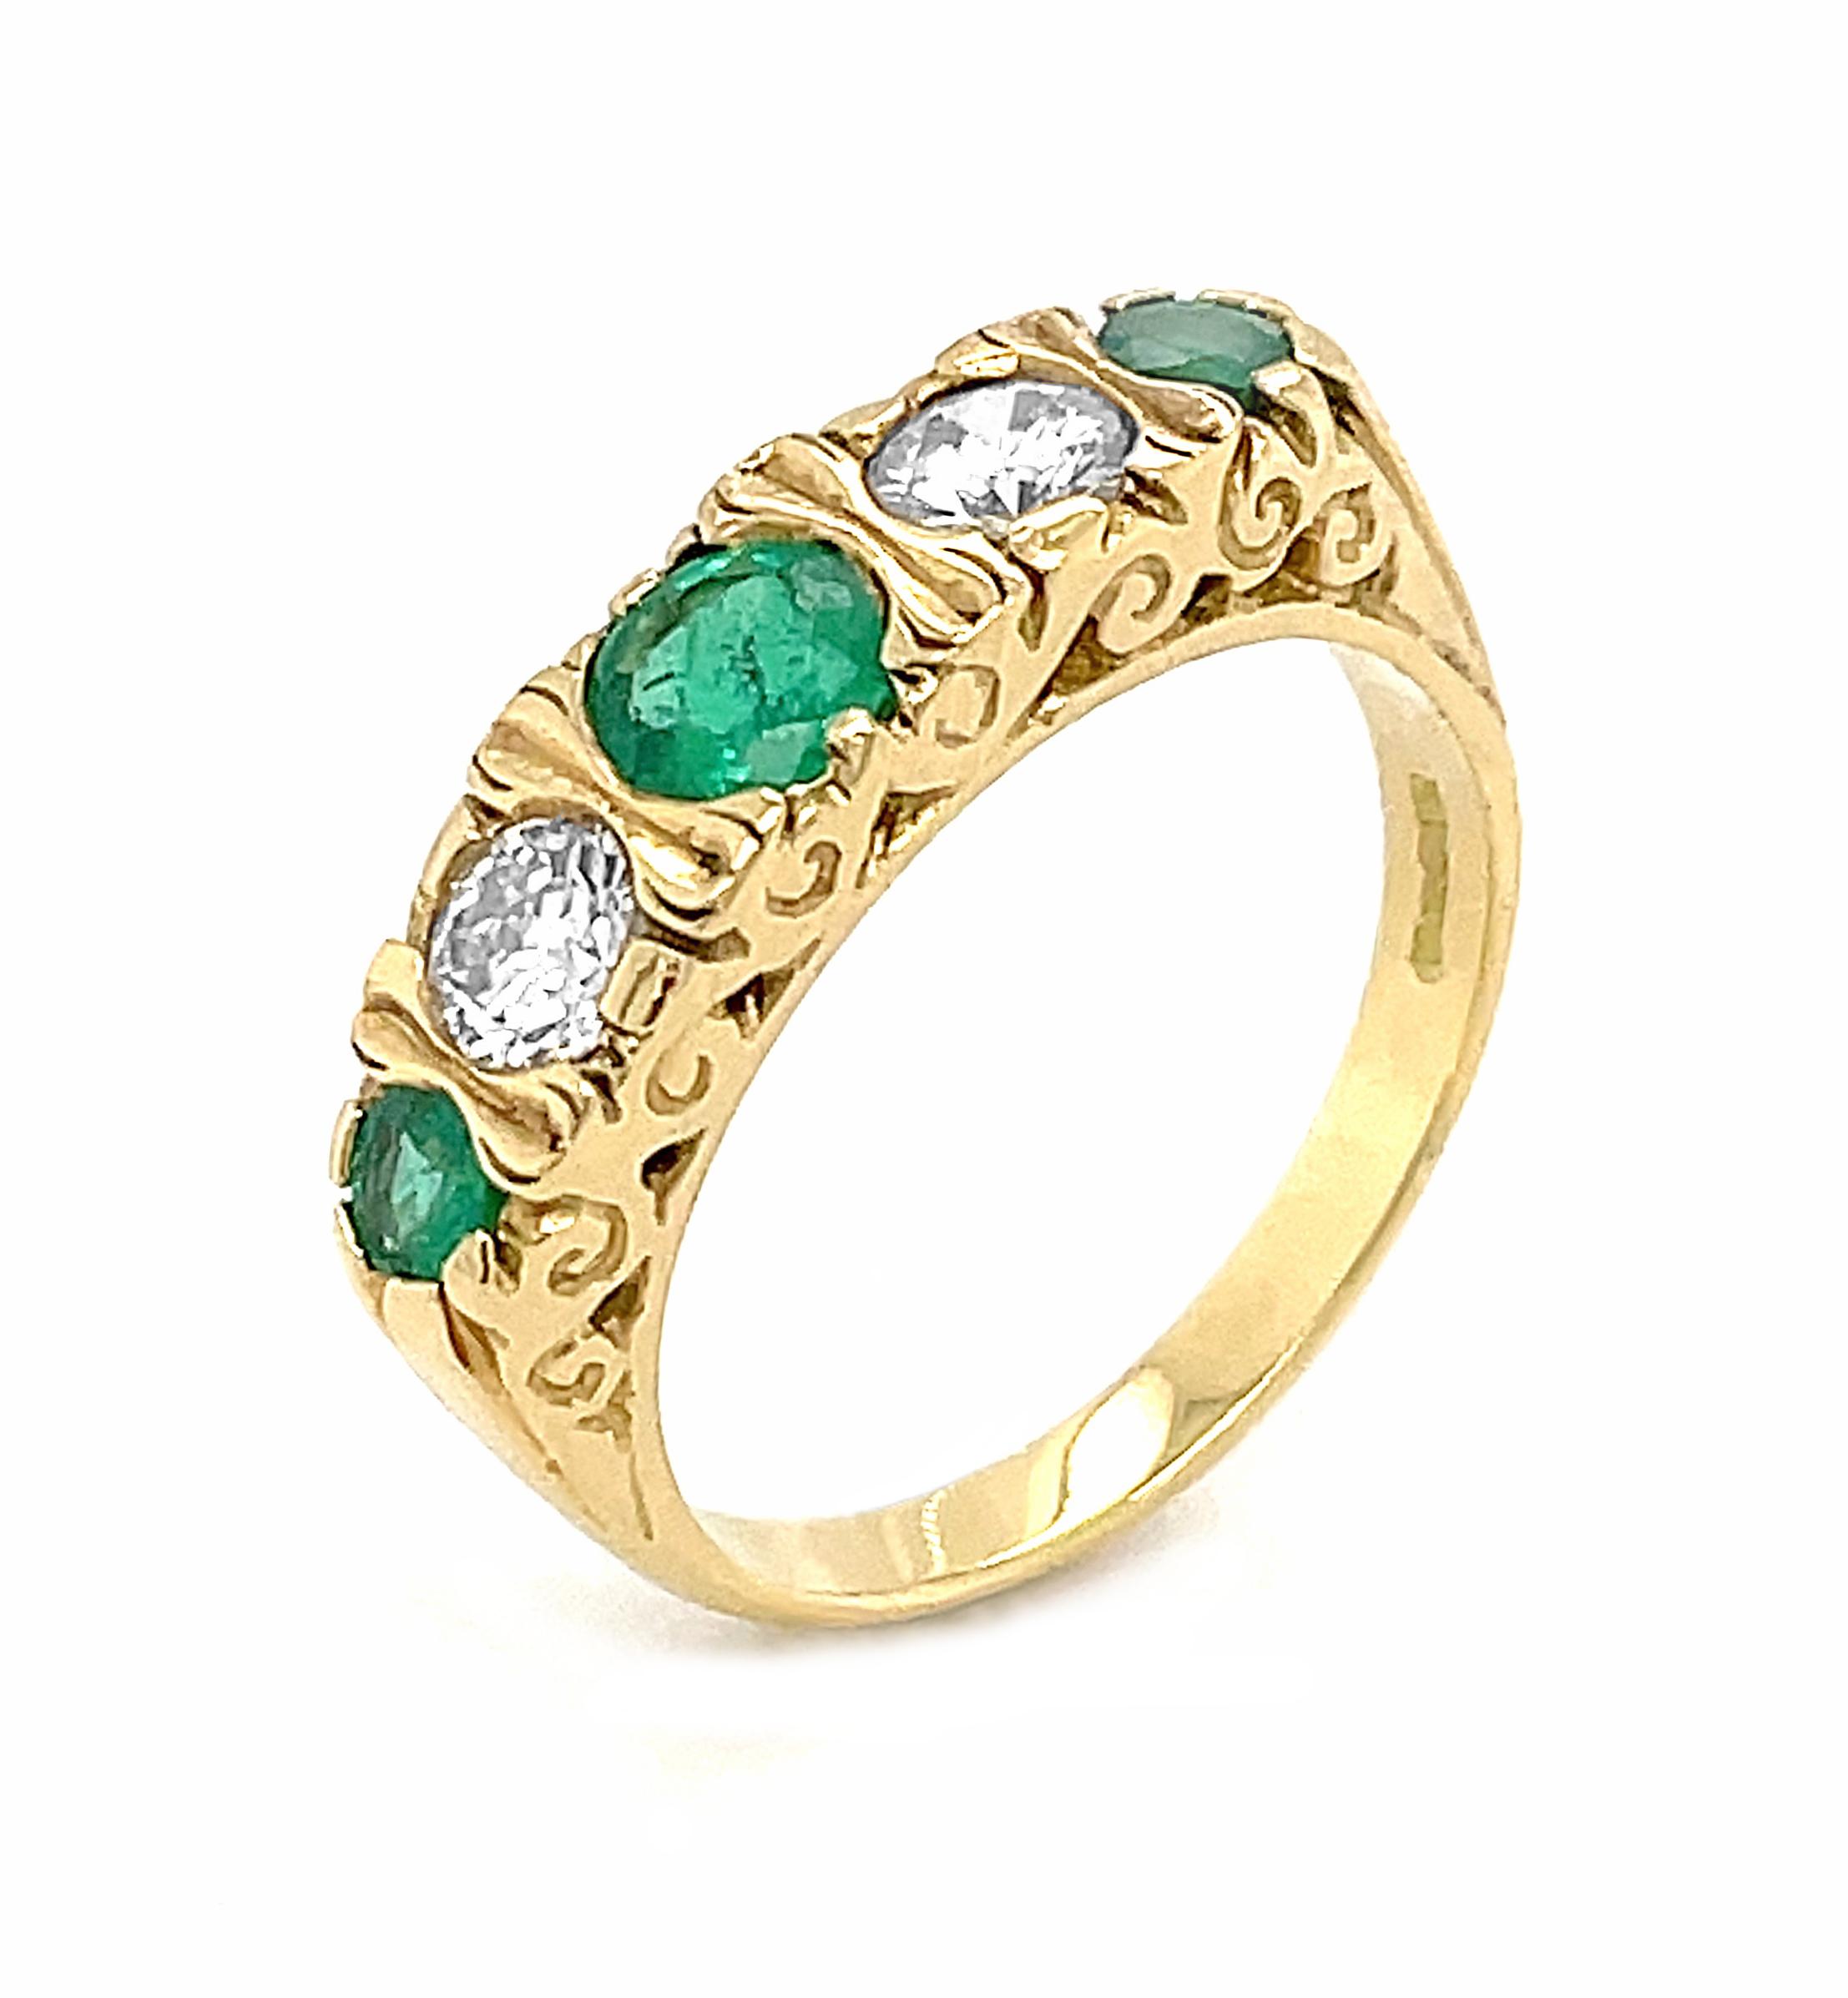 18k Yellow Gold 5 Stone Round Emerald & Brilliant Cut Diamond Antique Style Ring